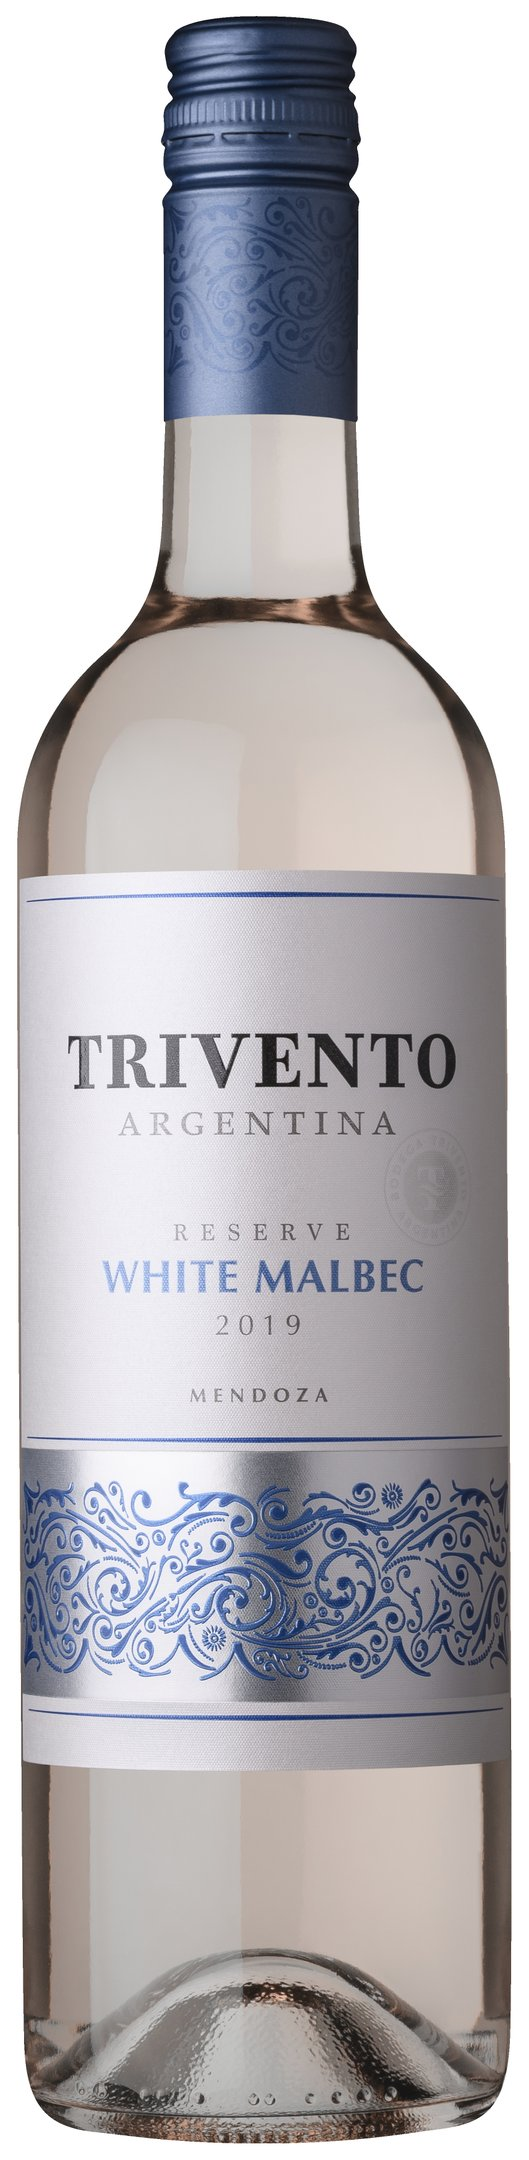 Trivento White Malbec 2019